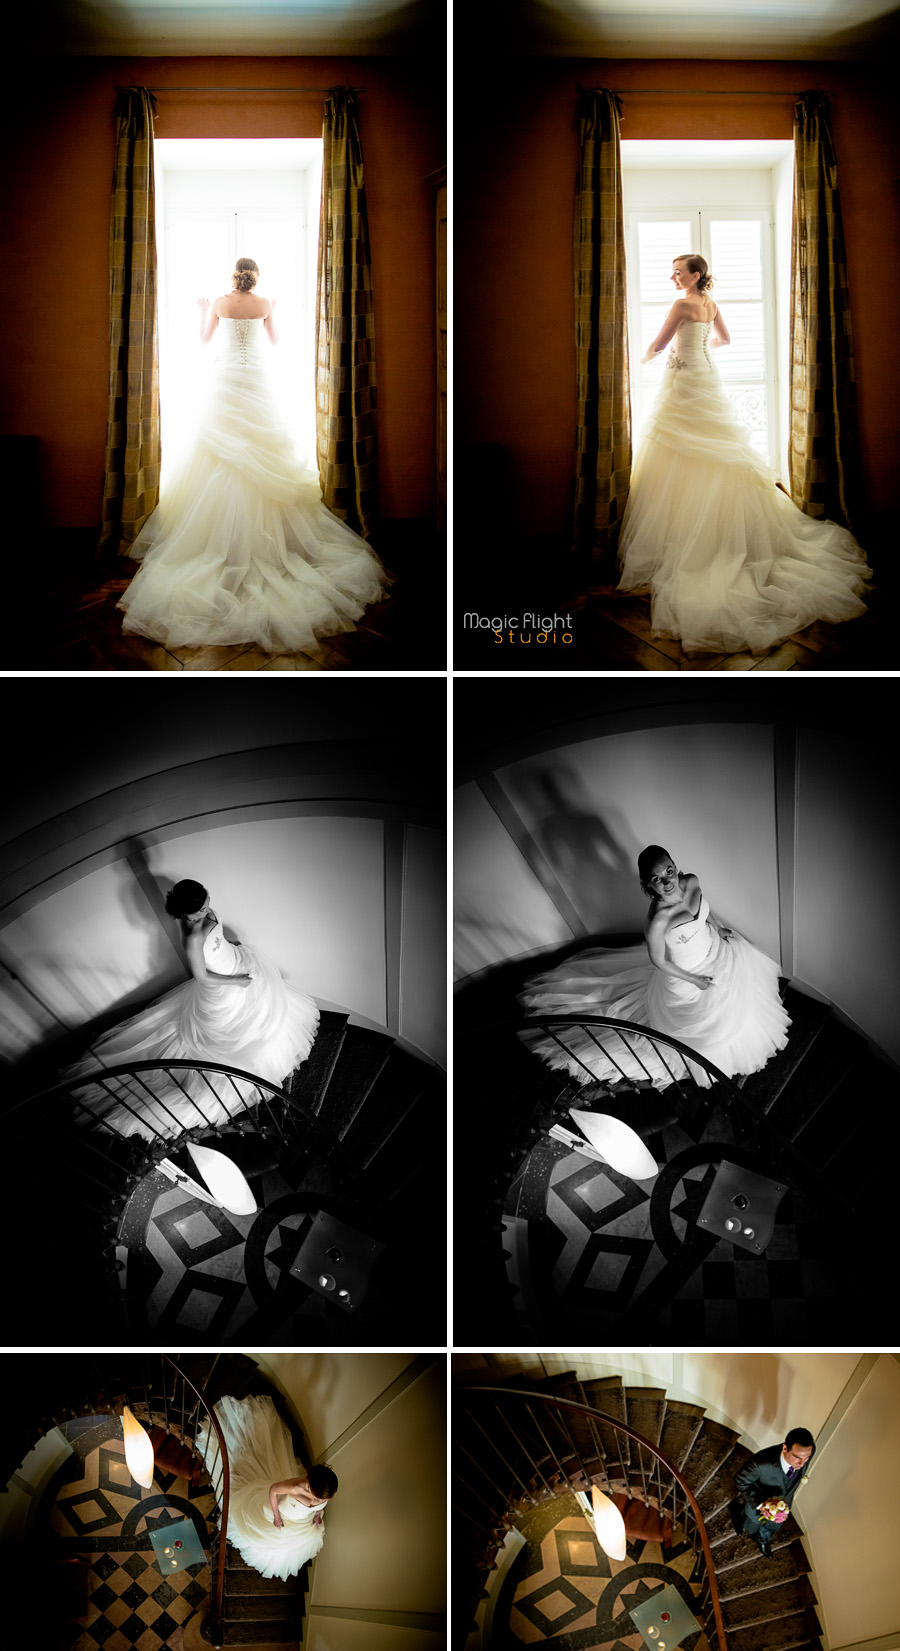 photographe mariage bourgogne chassagne montrachet